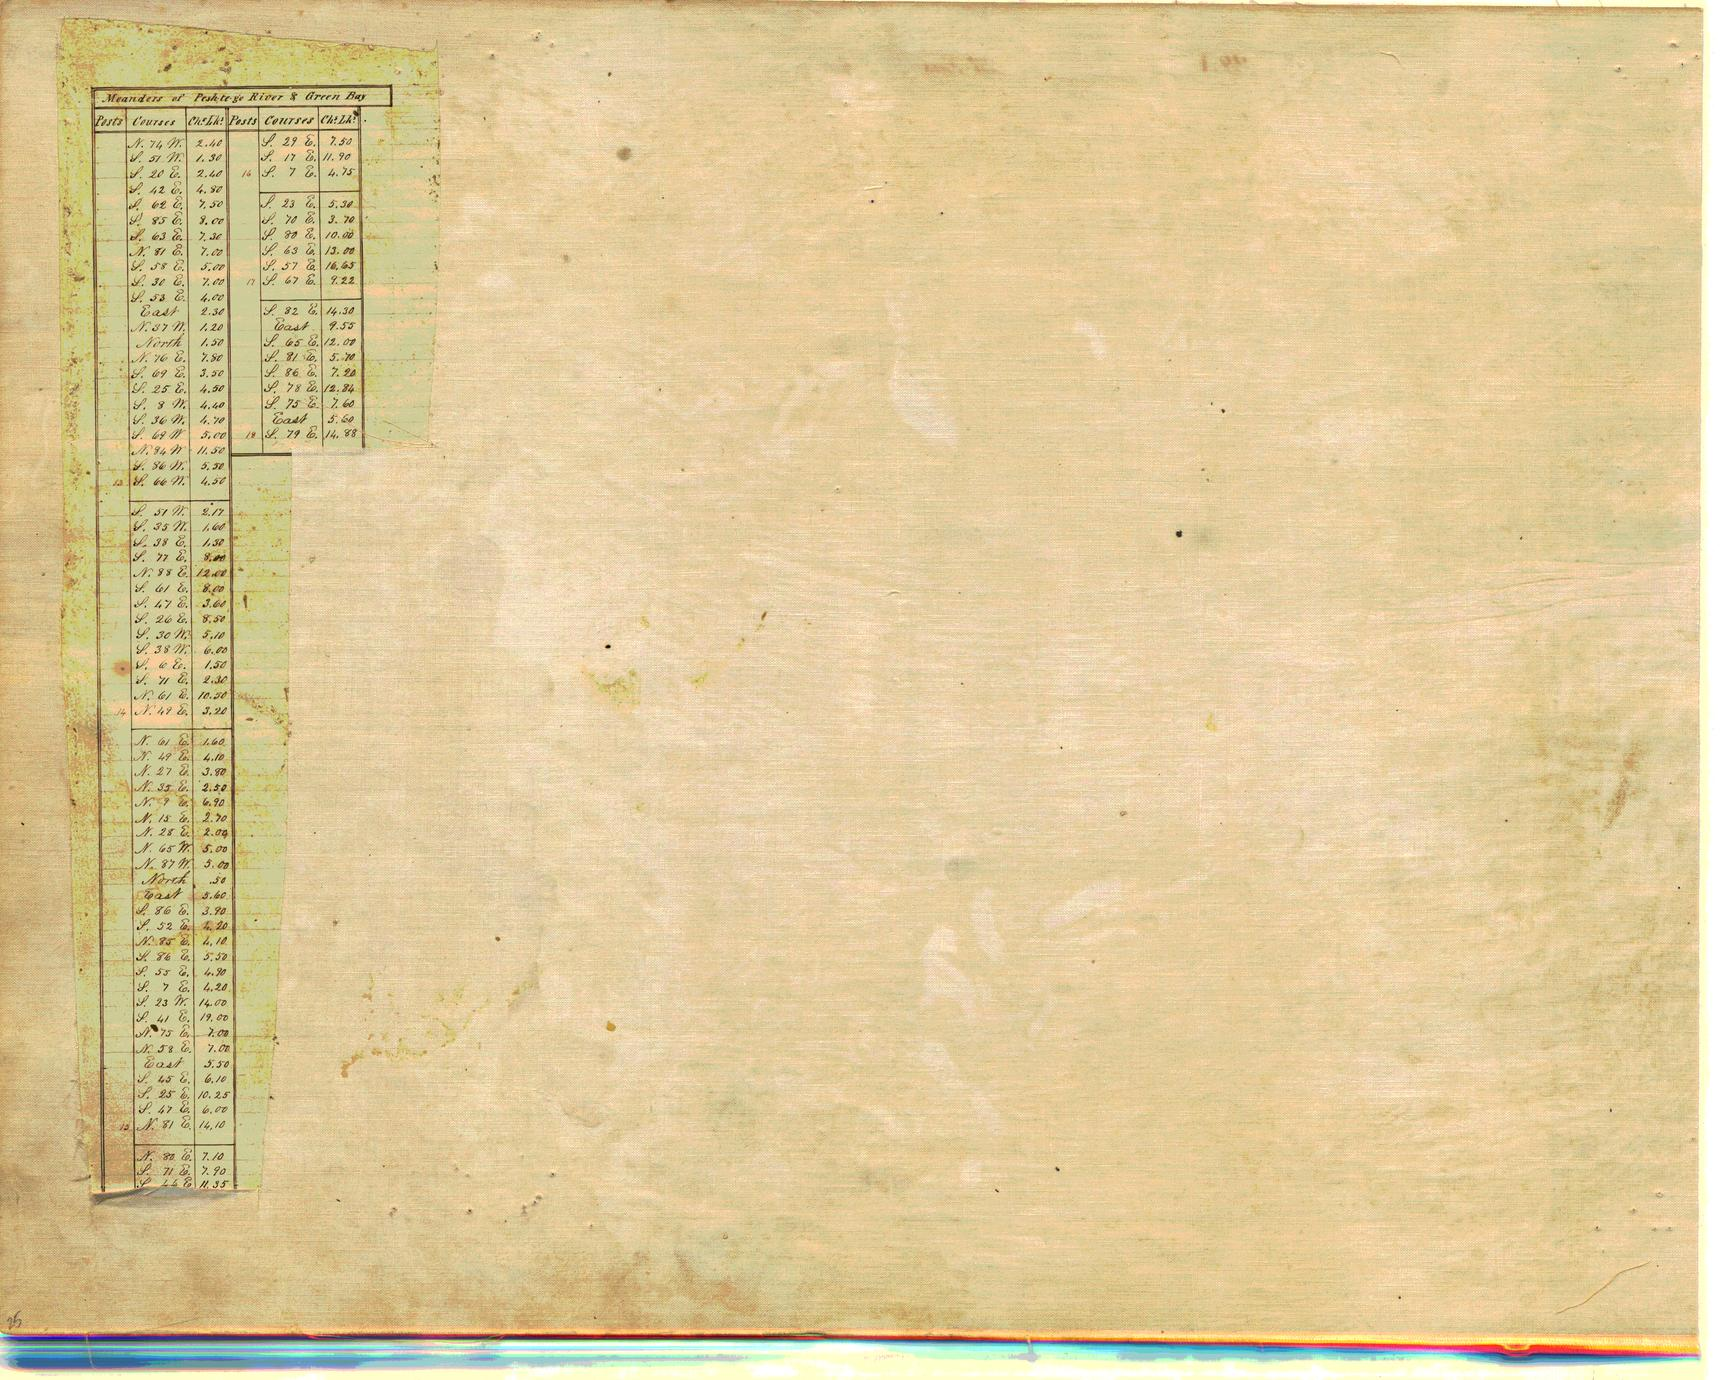 [Public Land Survey System map: Wisconsin Township 29 North, Range 23 East]